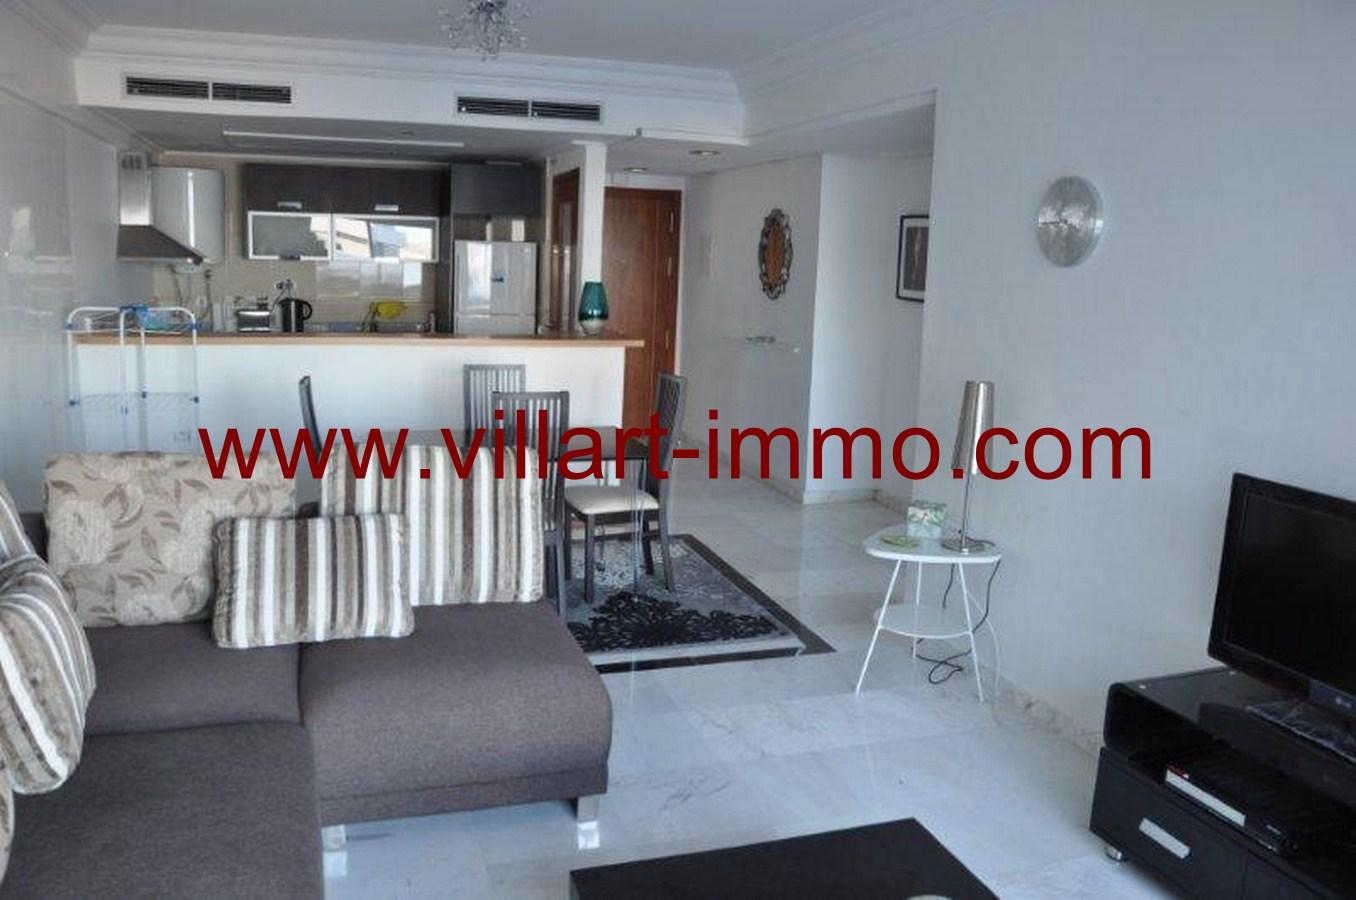 2-vente-appartement-tanger-centre-de-ville-salon-2-va462-villart-immo